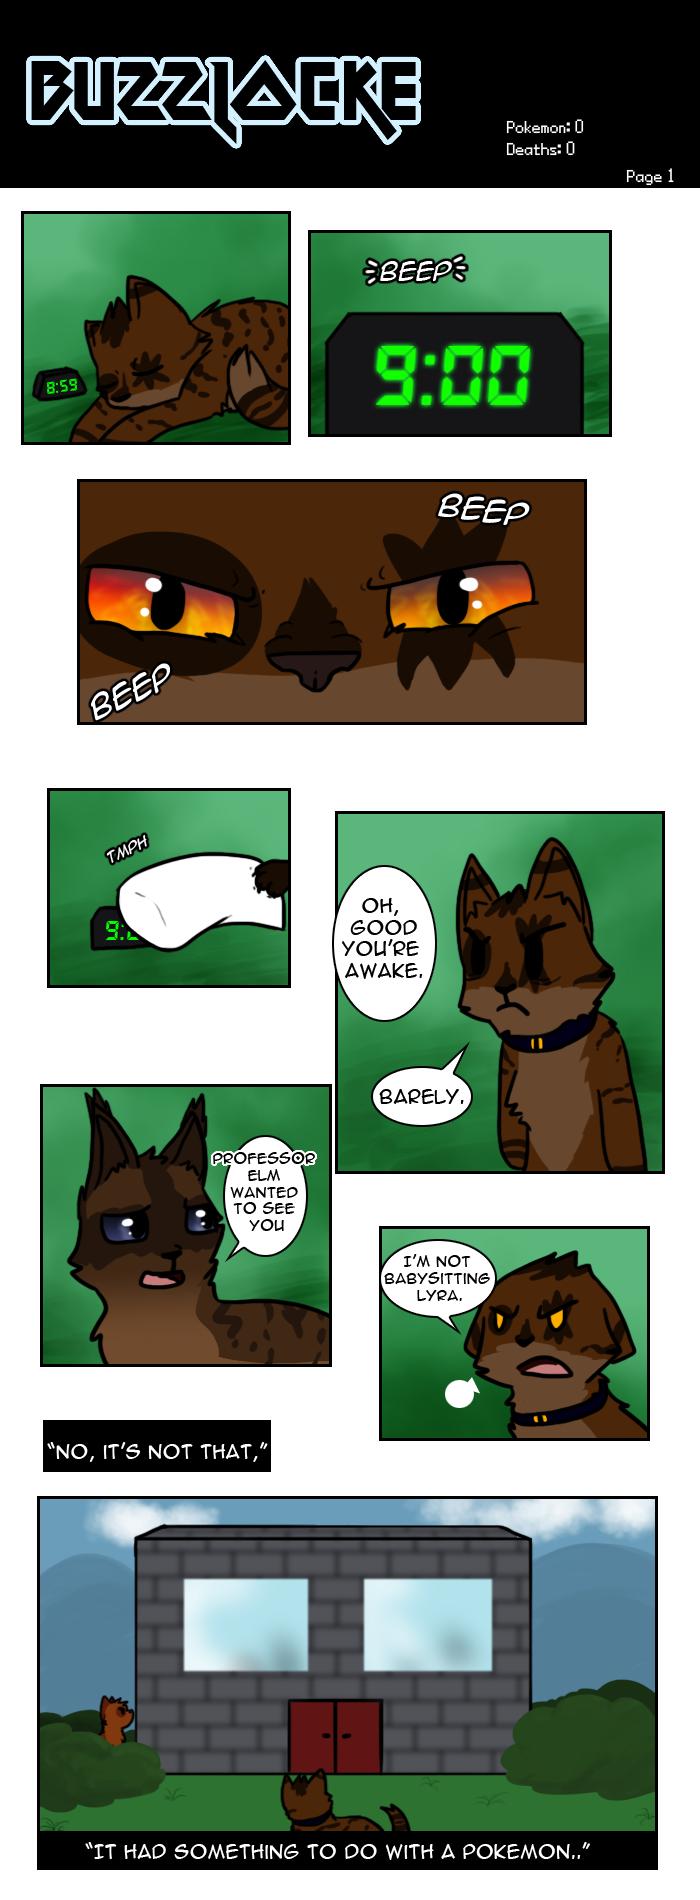 Buzzlocke page 1 by Spiritpie